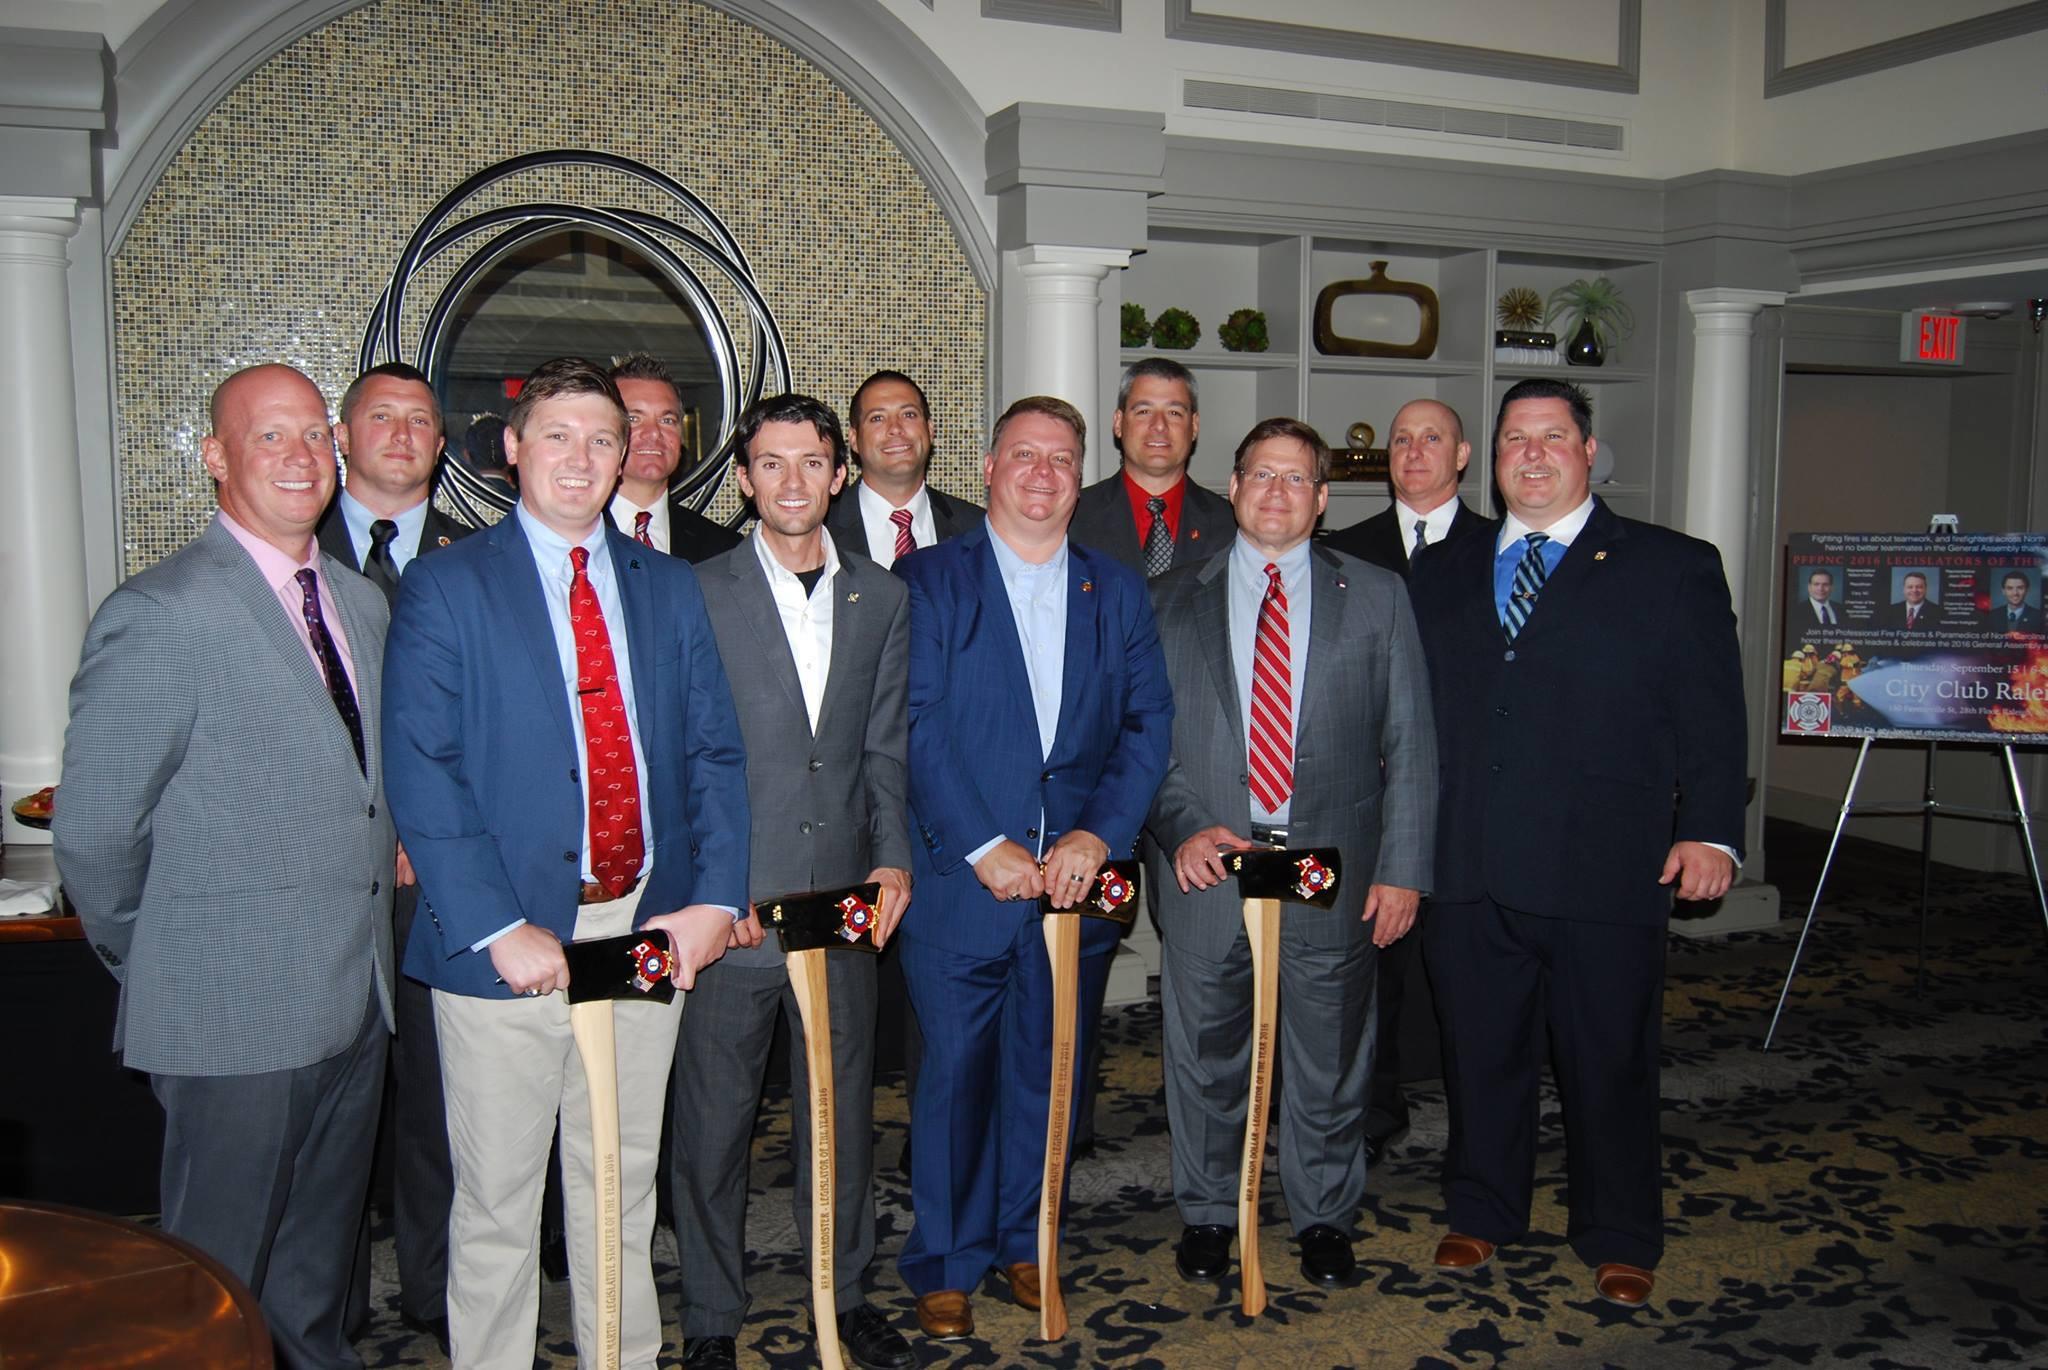 Members of PFFPNC and (L to R) Logan Martin, Jon Hardister, Jason Saine, & Nelson Dollar